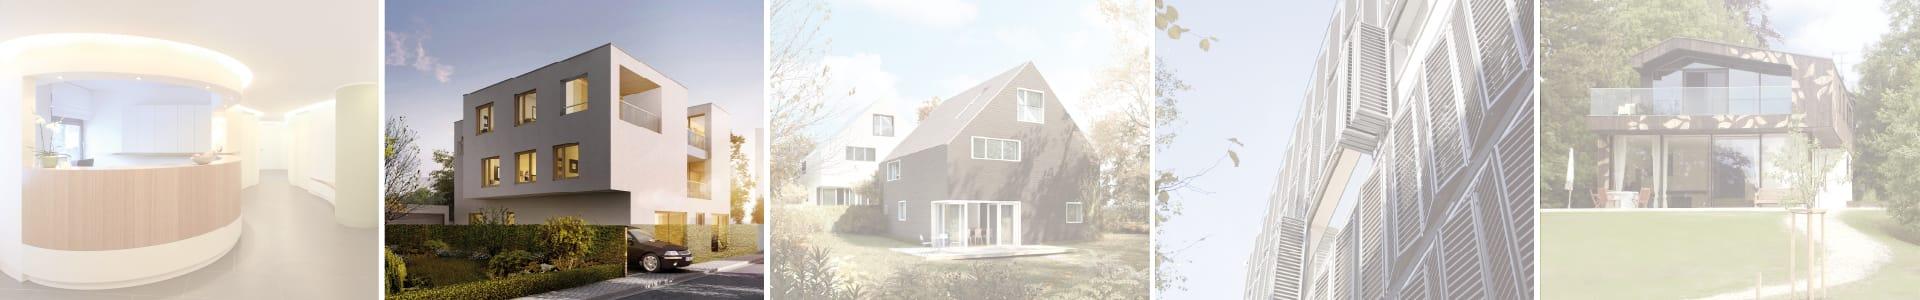 Planung Realisierung Mehrfamilienhaus in Dachau durch KR Häuser GmbH